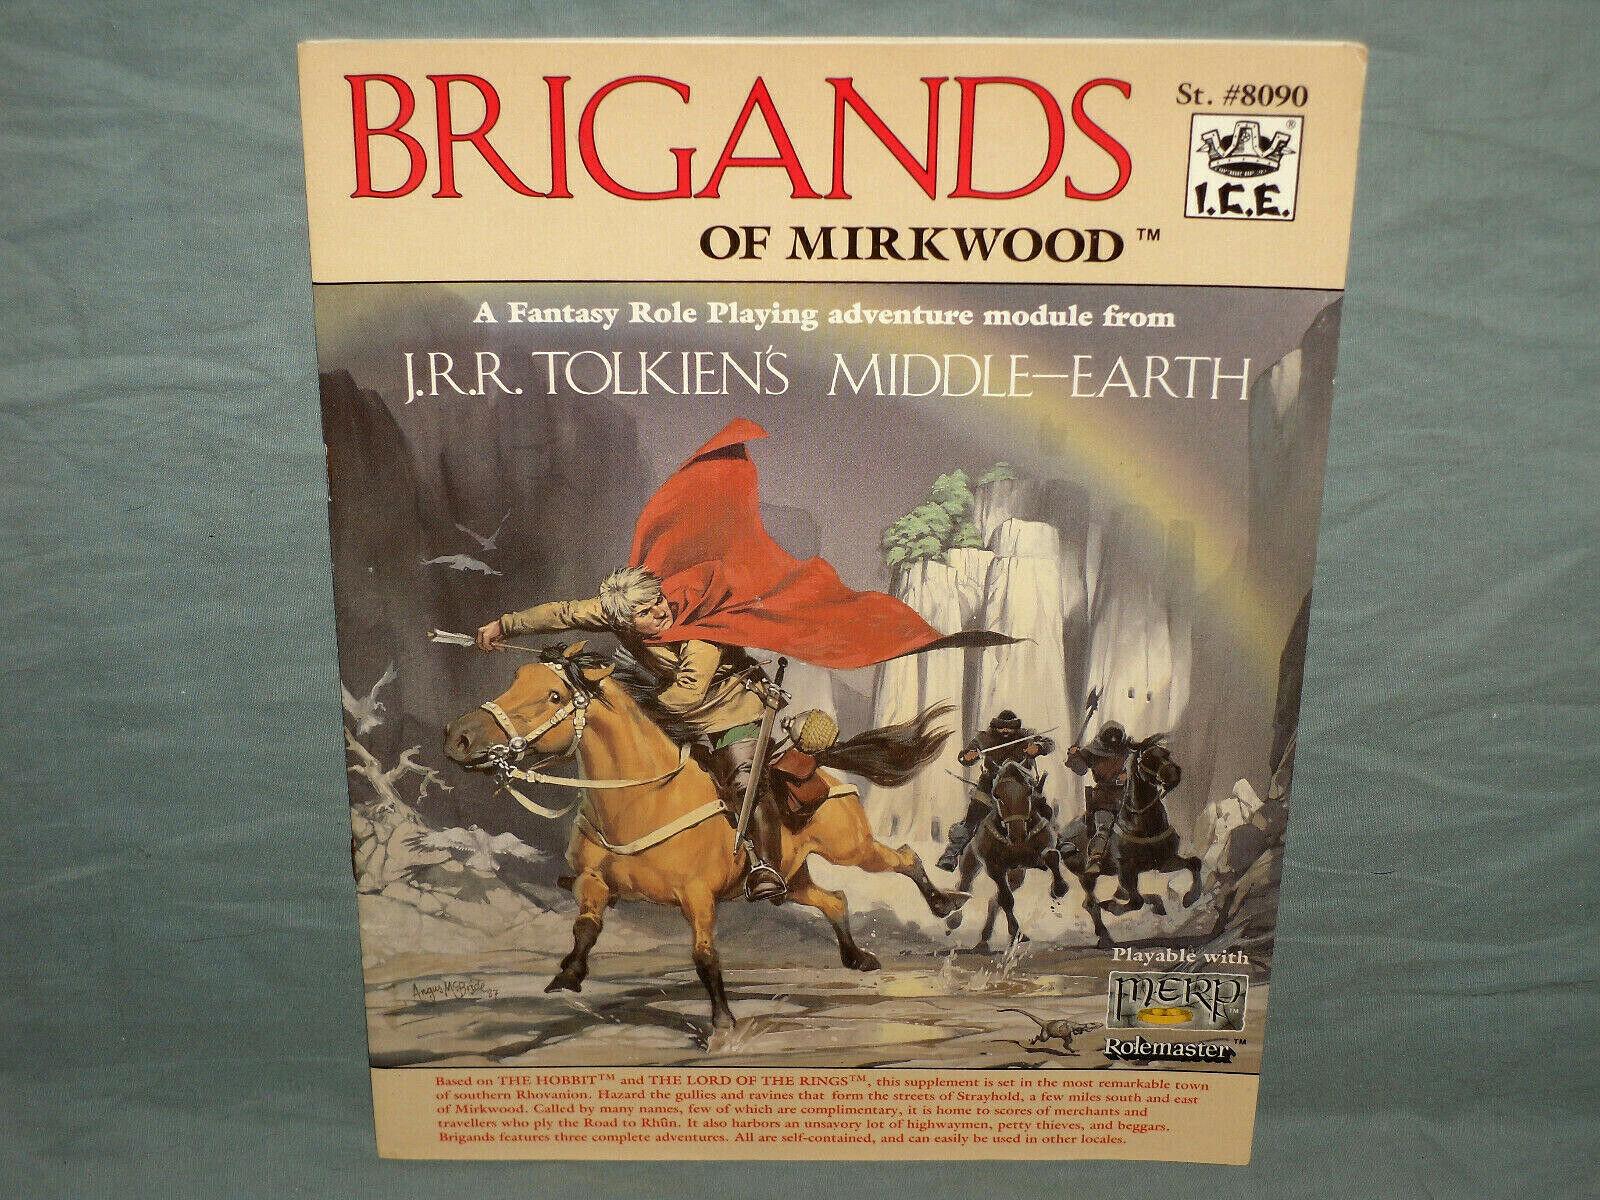 ICE  MERP 1st Ed Adventure -  BRIGeS OF MIRKWOOD  (HARD TO FIND e NR MINT  )  economico e alla moda